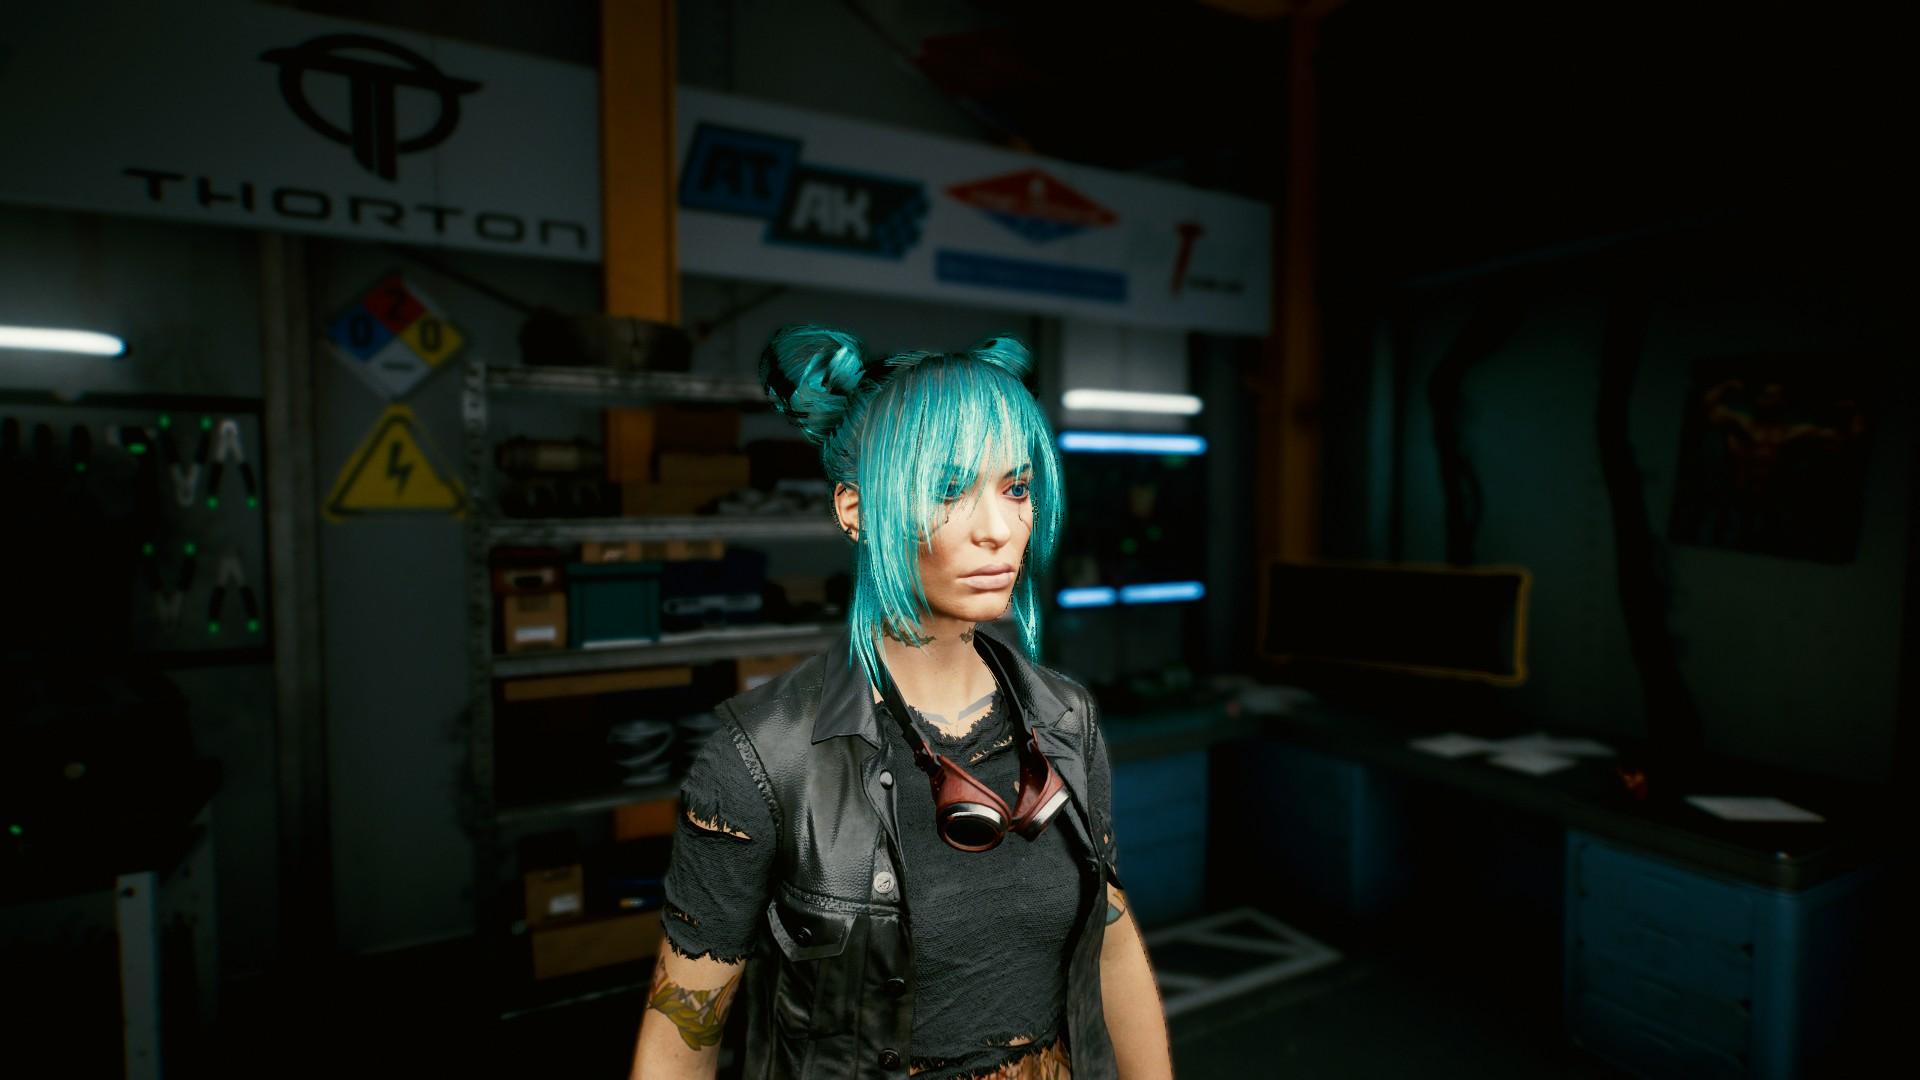 Cyberpunk 2077: Saving - All Paths